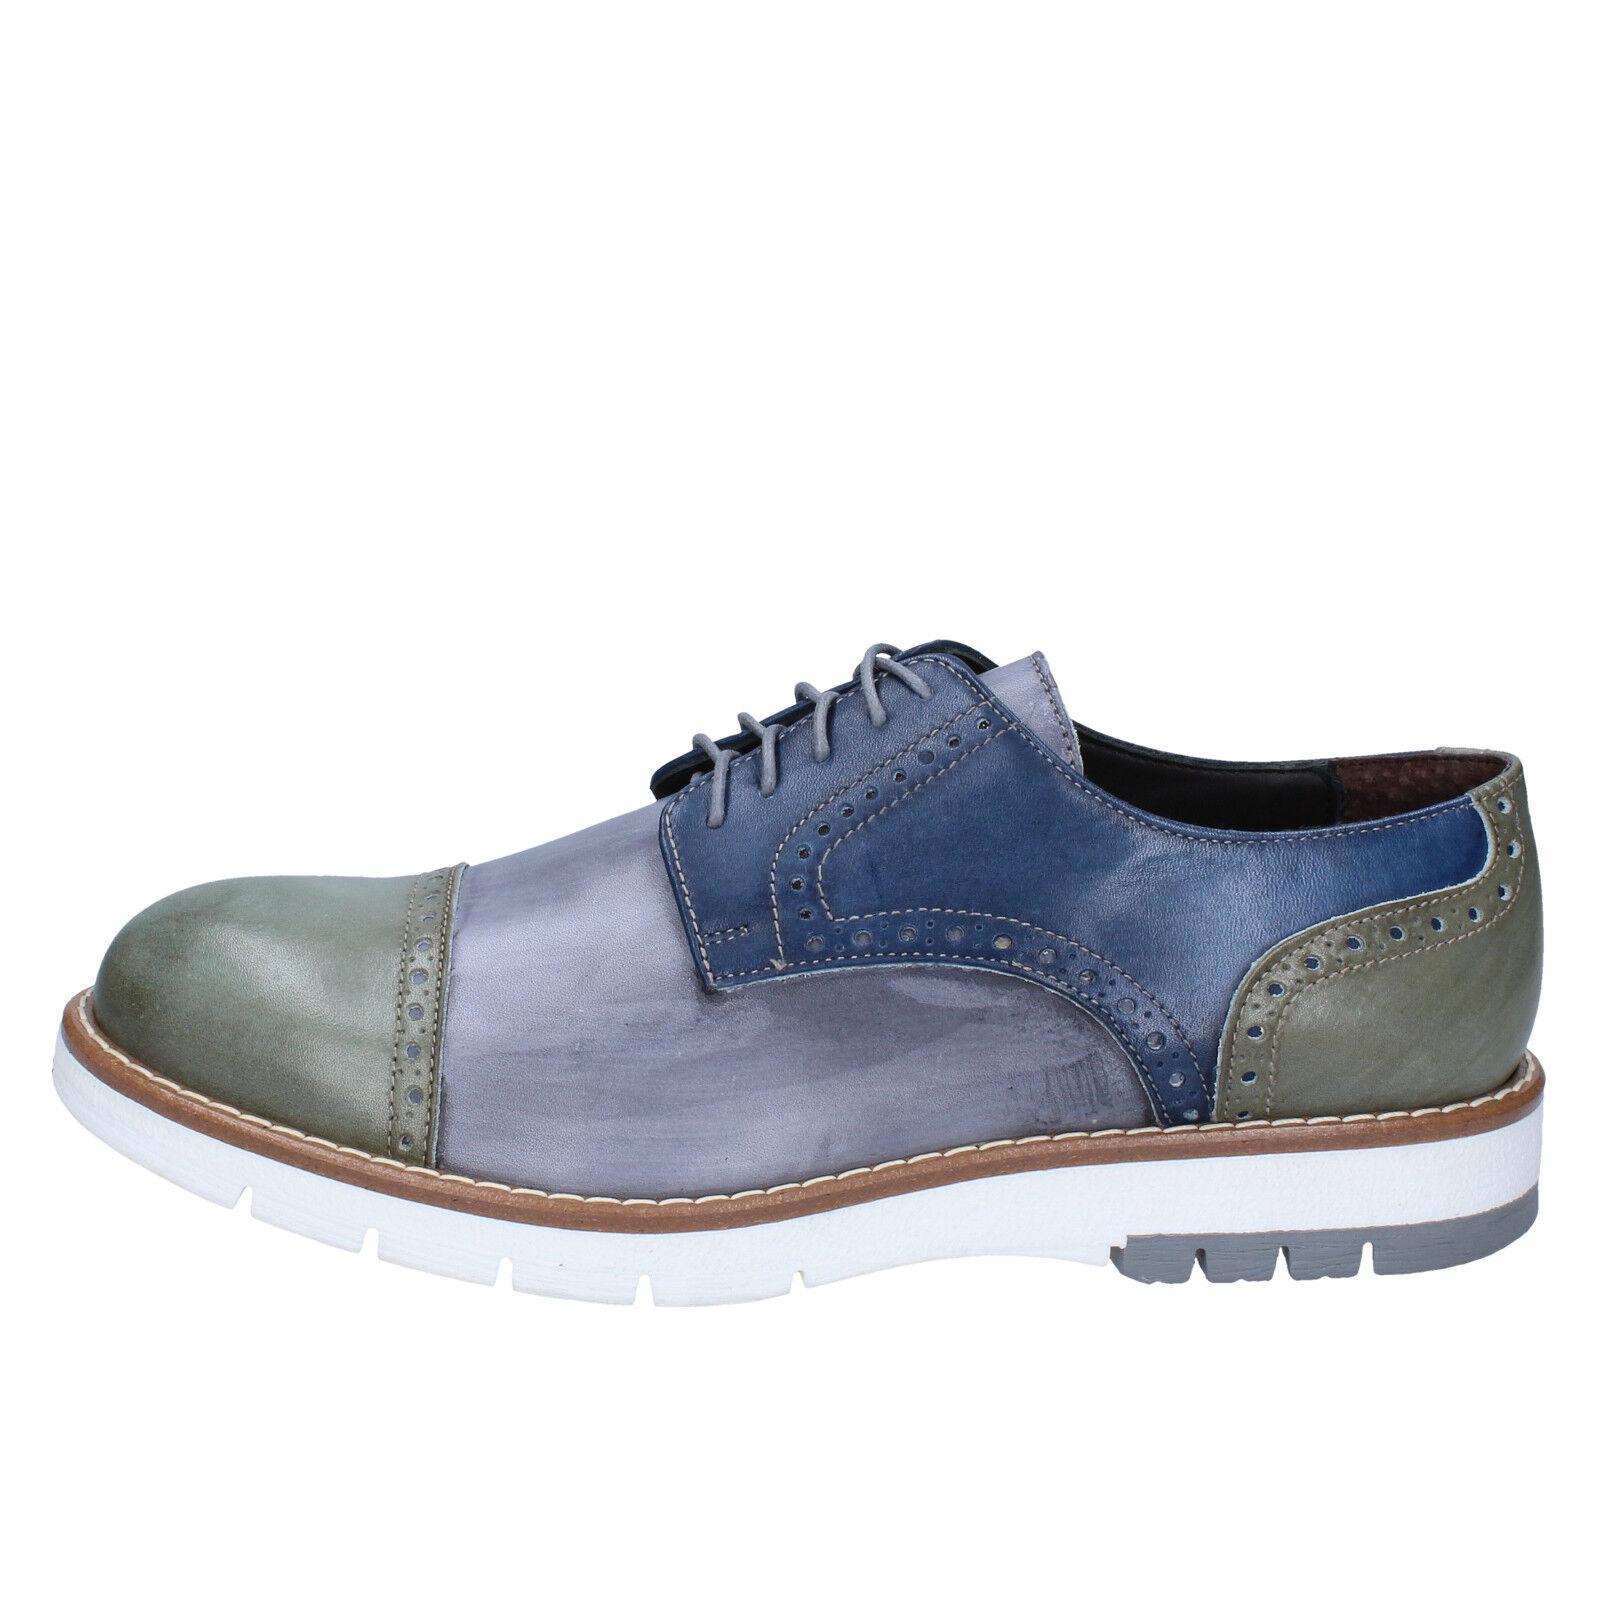 Mens shoes DI MELLA 7 (EU 41) elegant bluee grey leather BZ41-B